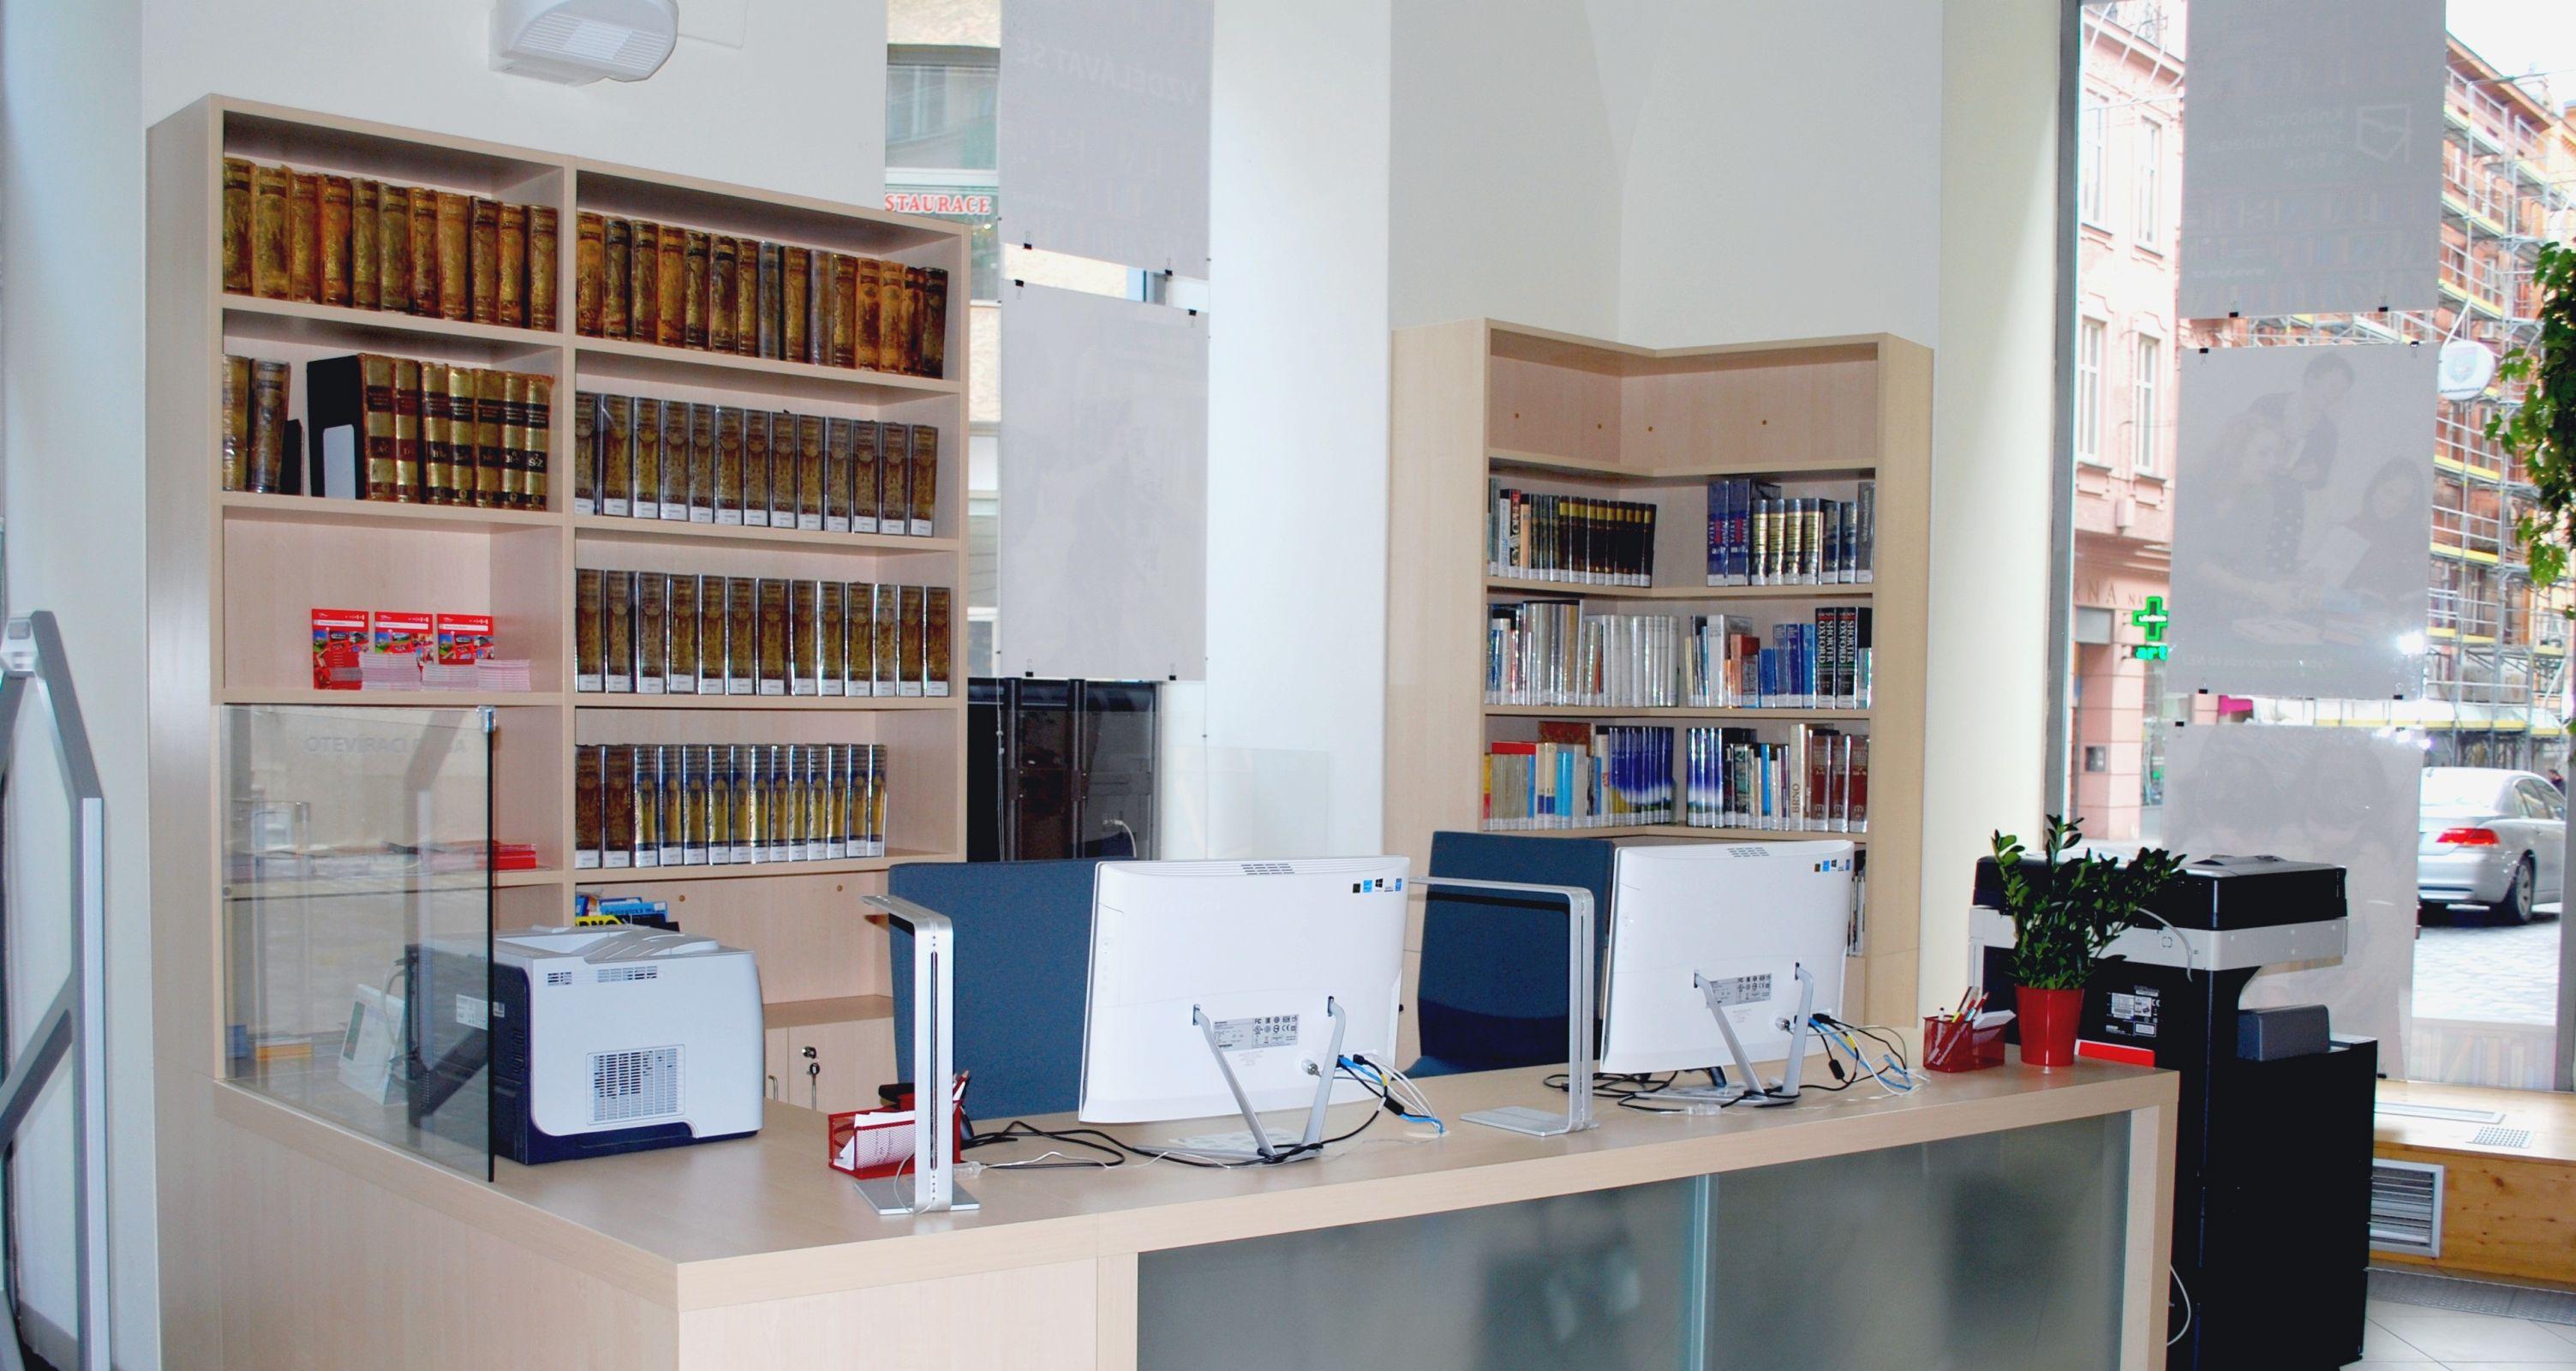 Jiří Mahen Library (Knihovna Jiřího Mahena) in Brno